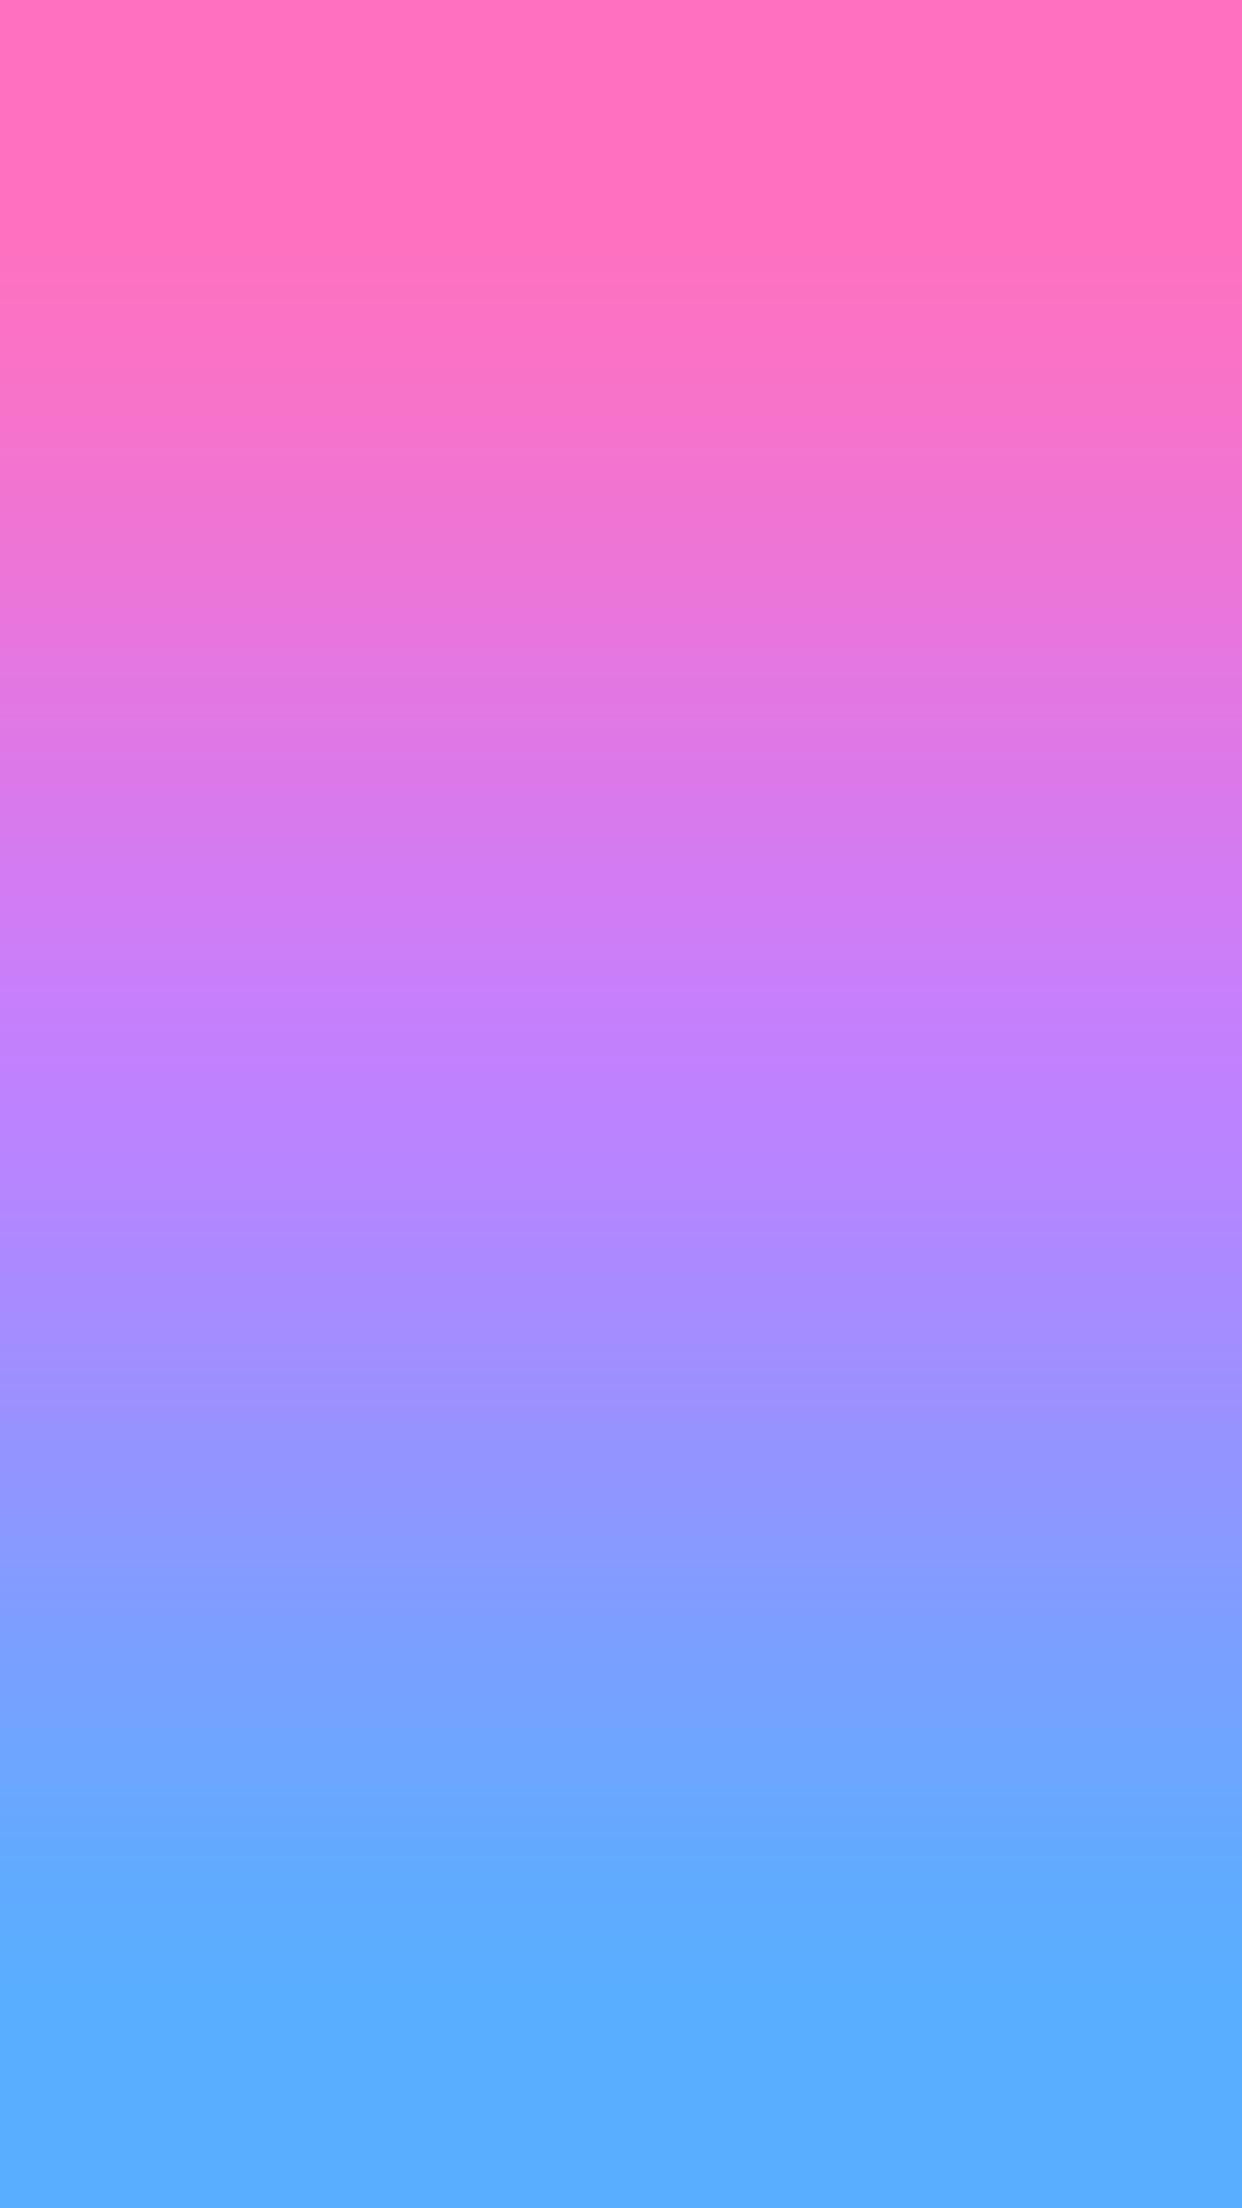 … Pink Purple Blue Violet Gradient Ombre Wallpaper Background. Download